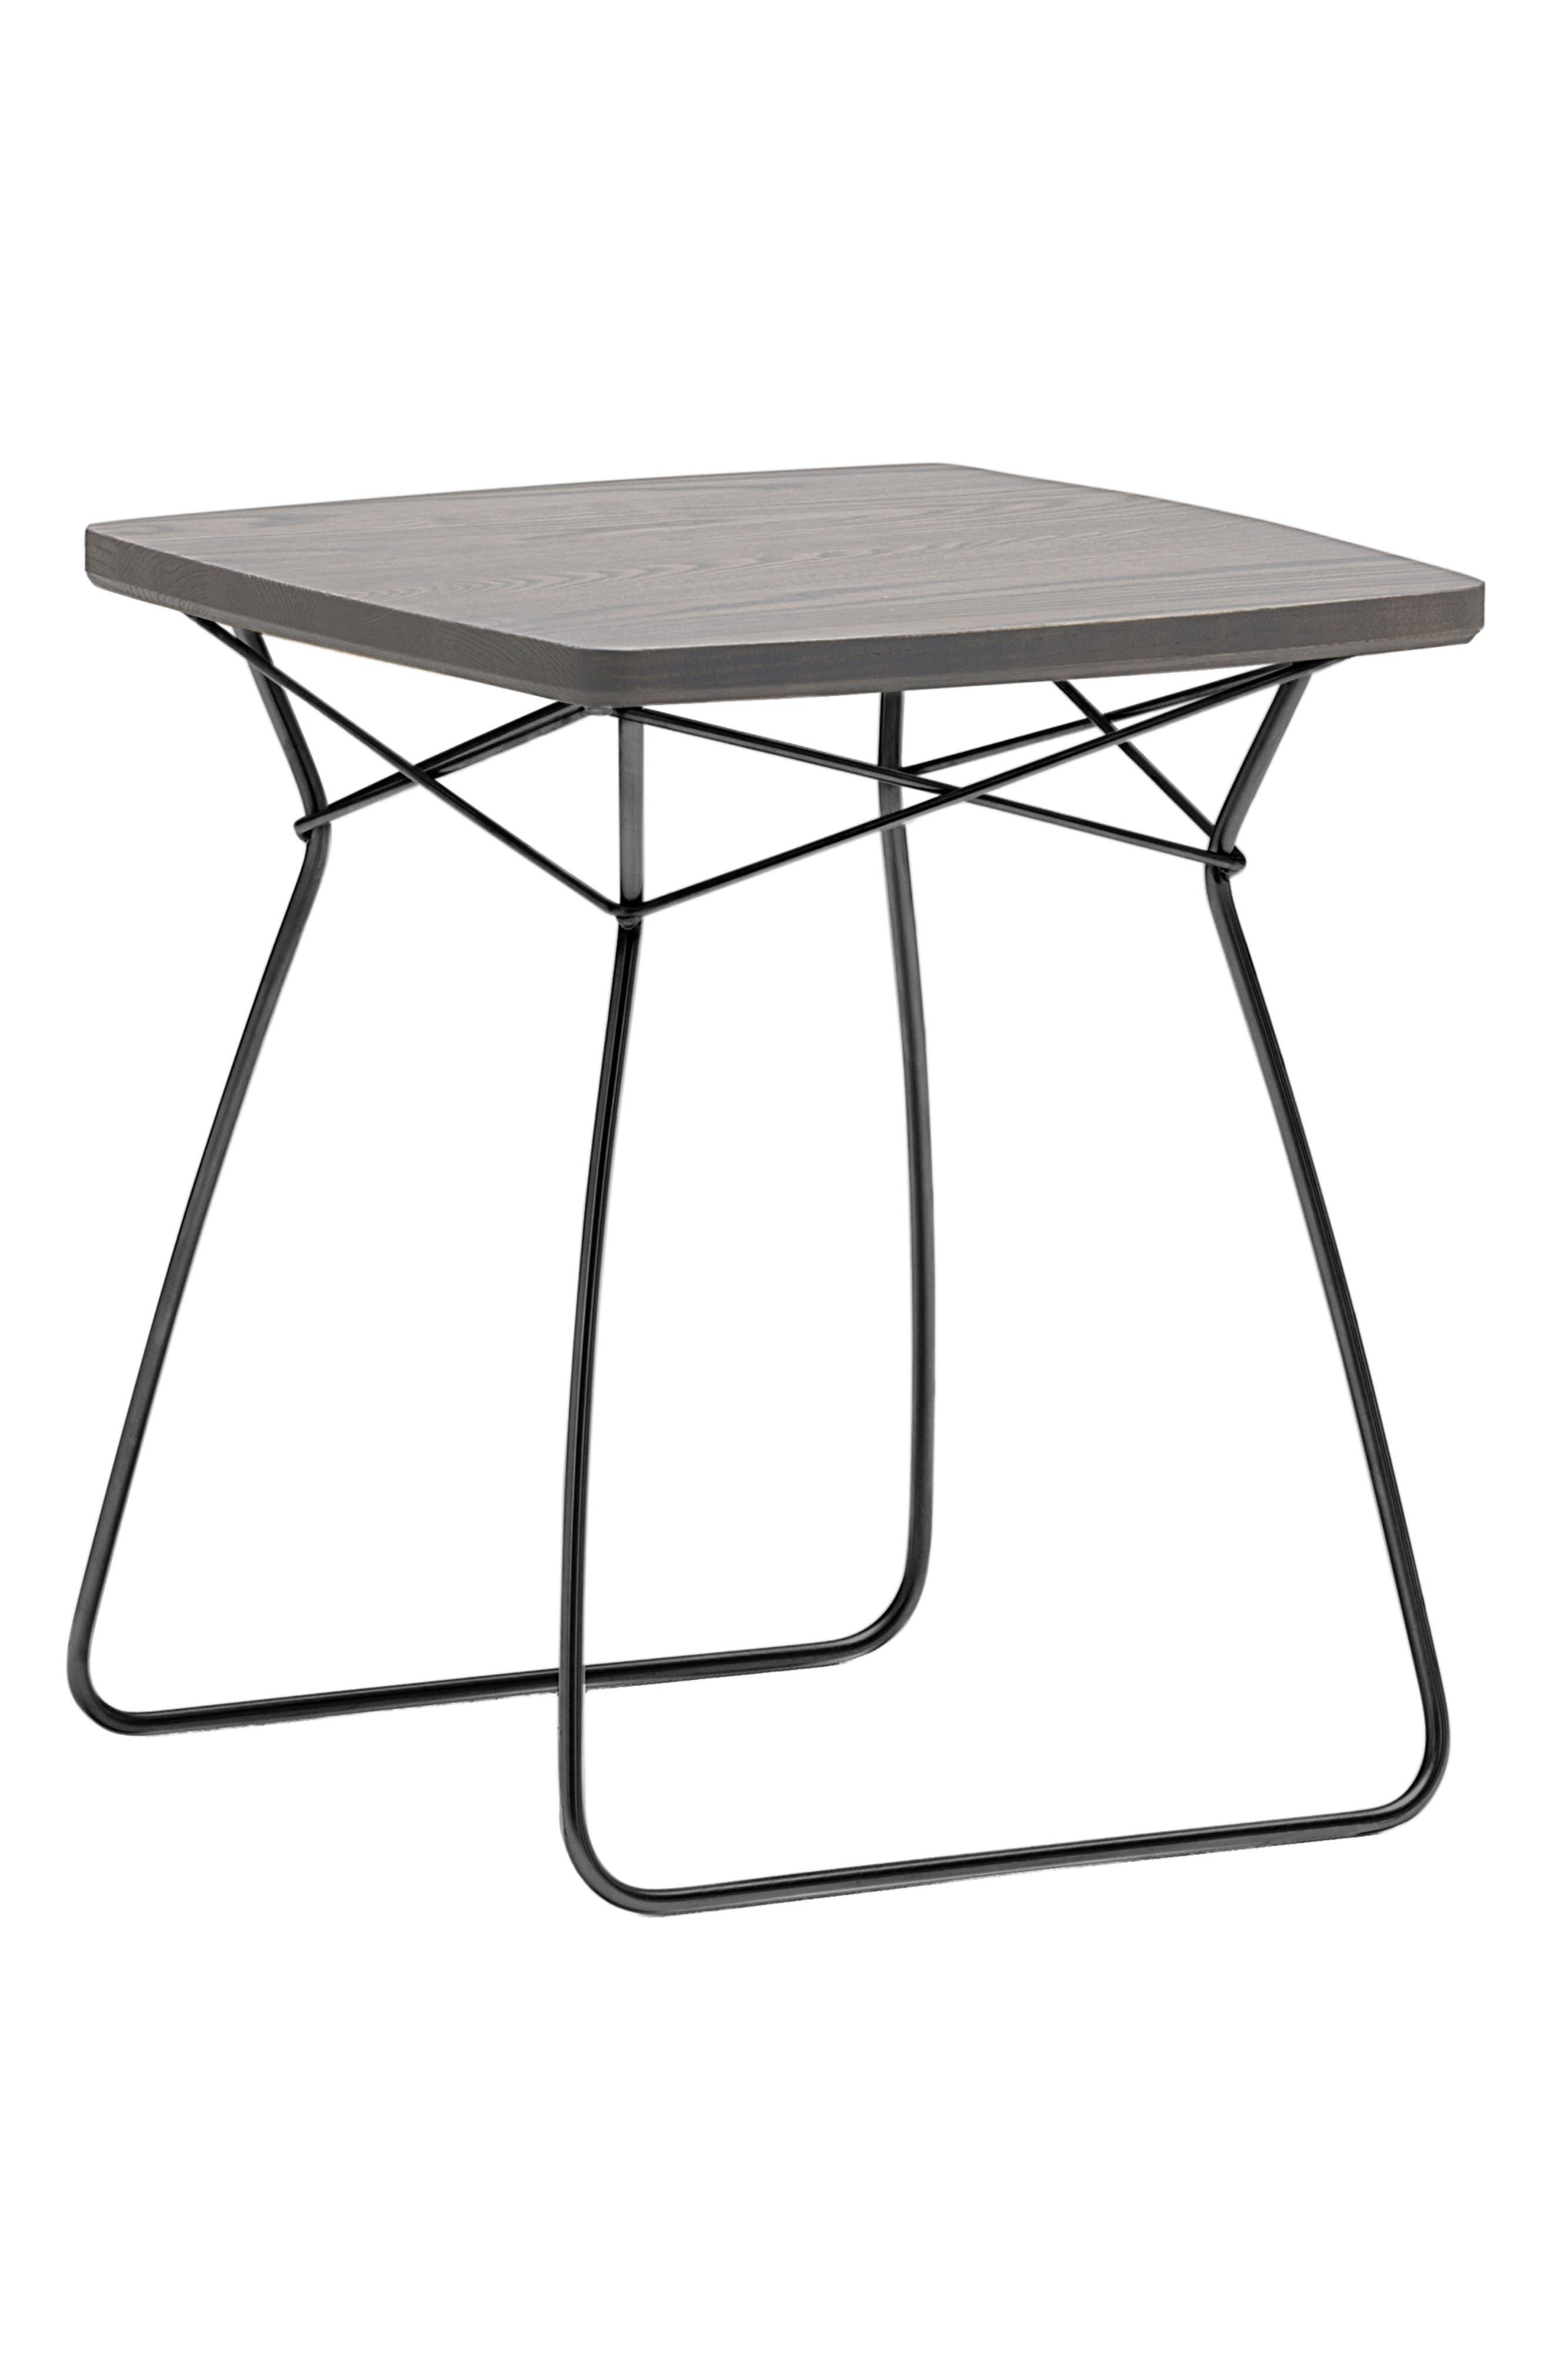 Dalt Side Table,                             Main thumbnail 1, color,                             ASH DARK